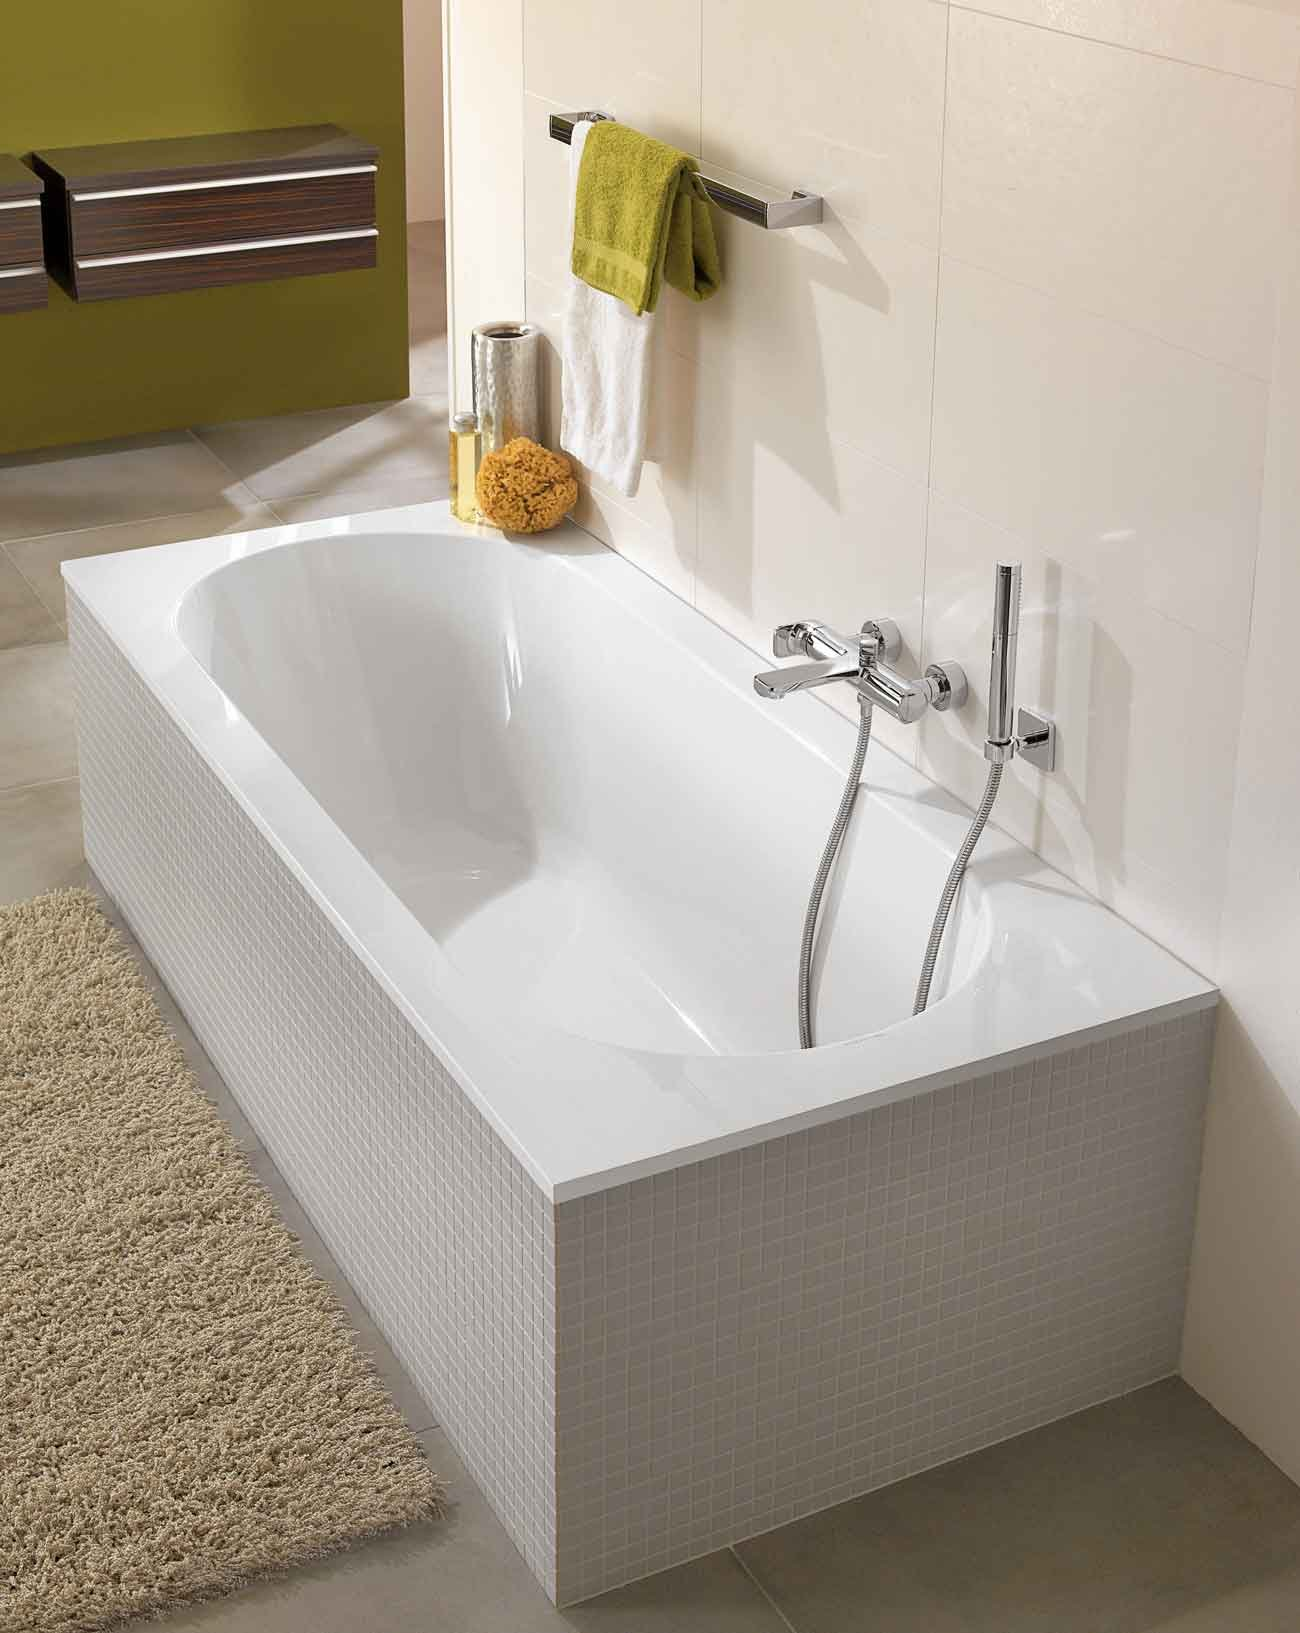 vasche per ogni esigenza di spazio cose di casa. Black Bedroom Furniture Sets. Home Design Ideas